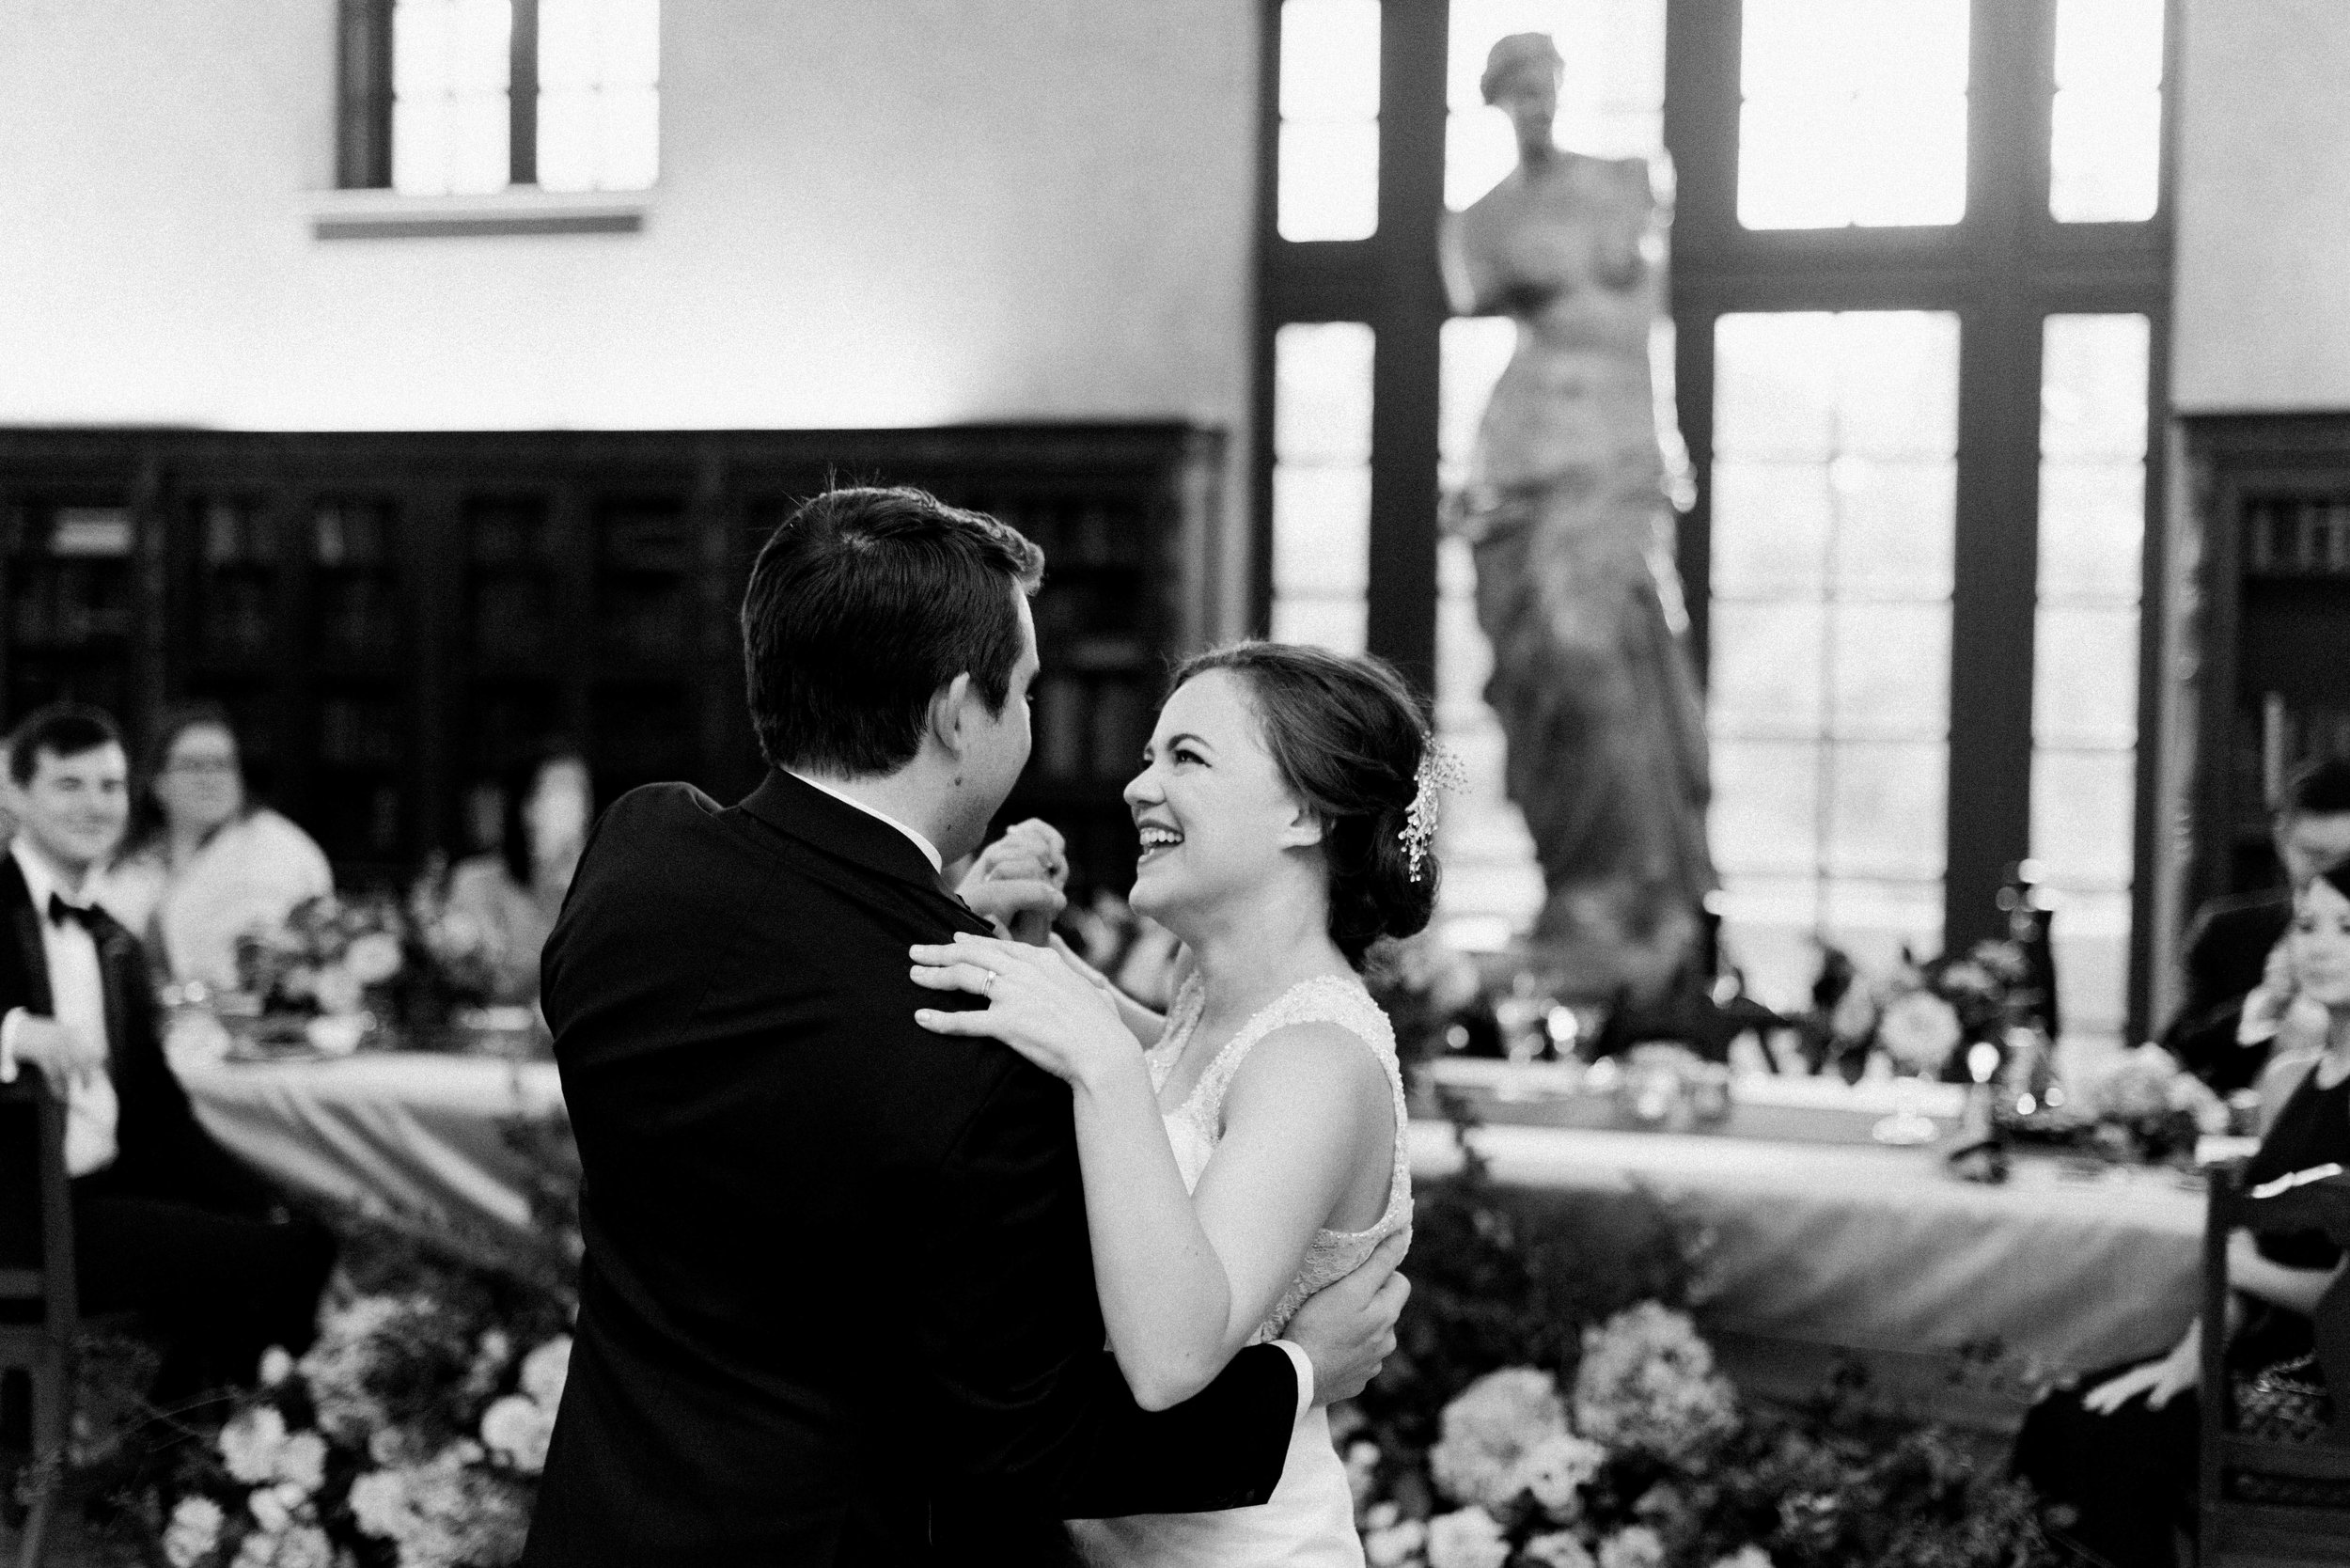 The-Knot-Texas-Fine-Art-Wedding-Film-Destination-Photographer-Houston-Austin-Dallas-New-Orleans-Julia-Ideson-Library-Event-Dana-Josh-Fernandez-Photograph-Top-Best-82.jpg